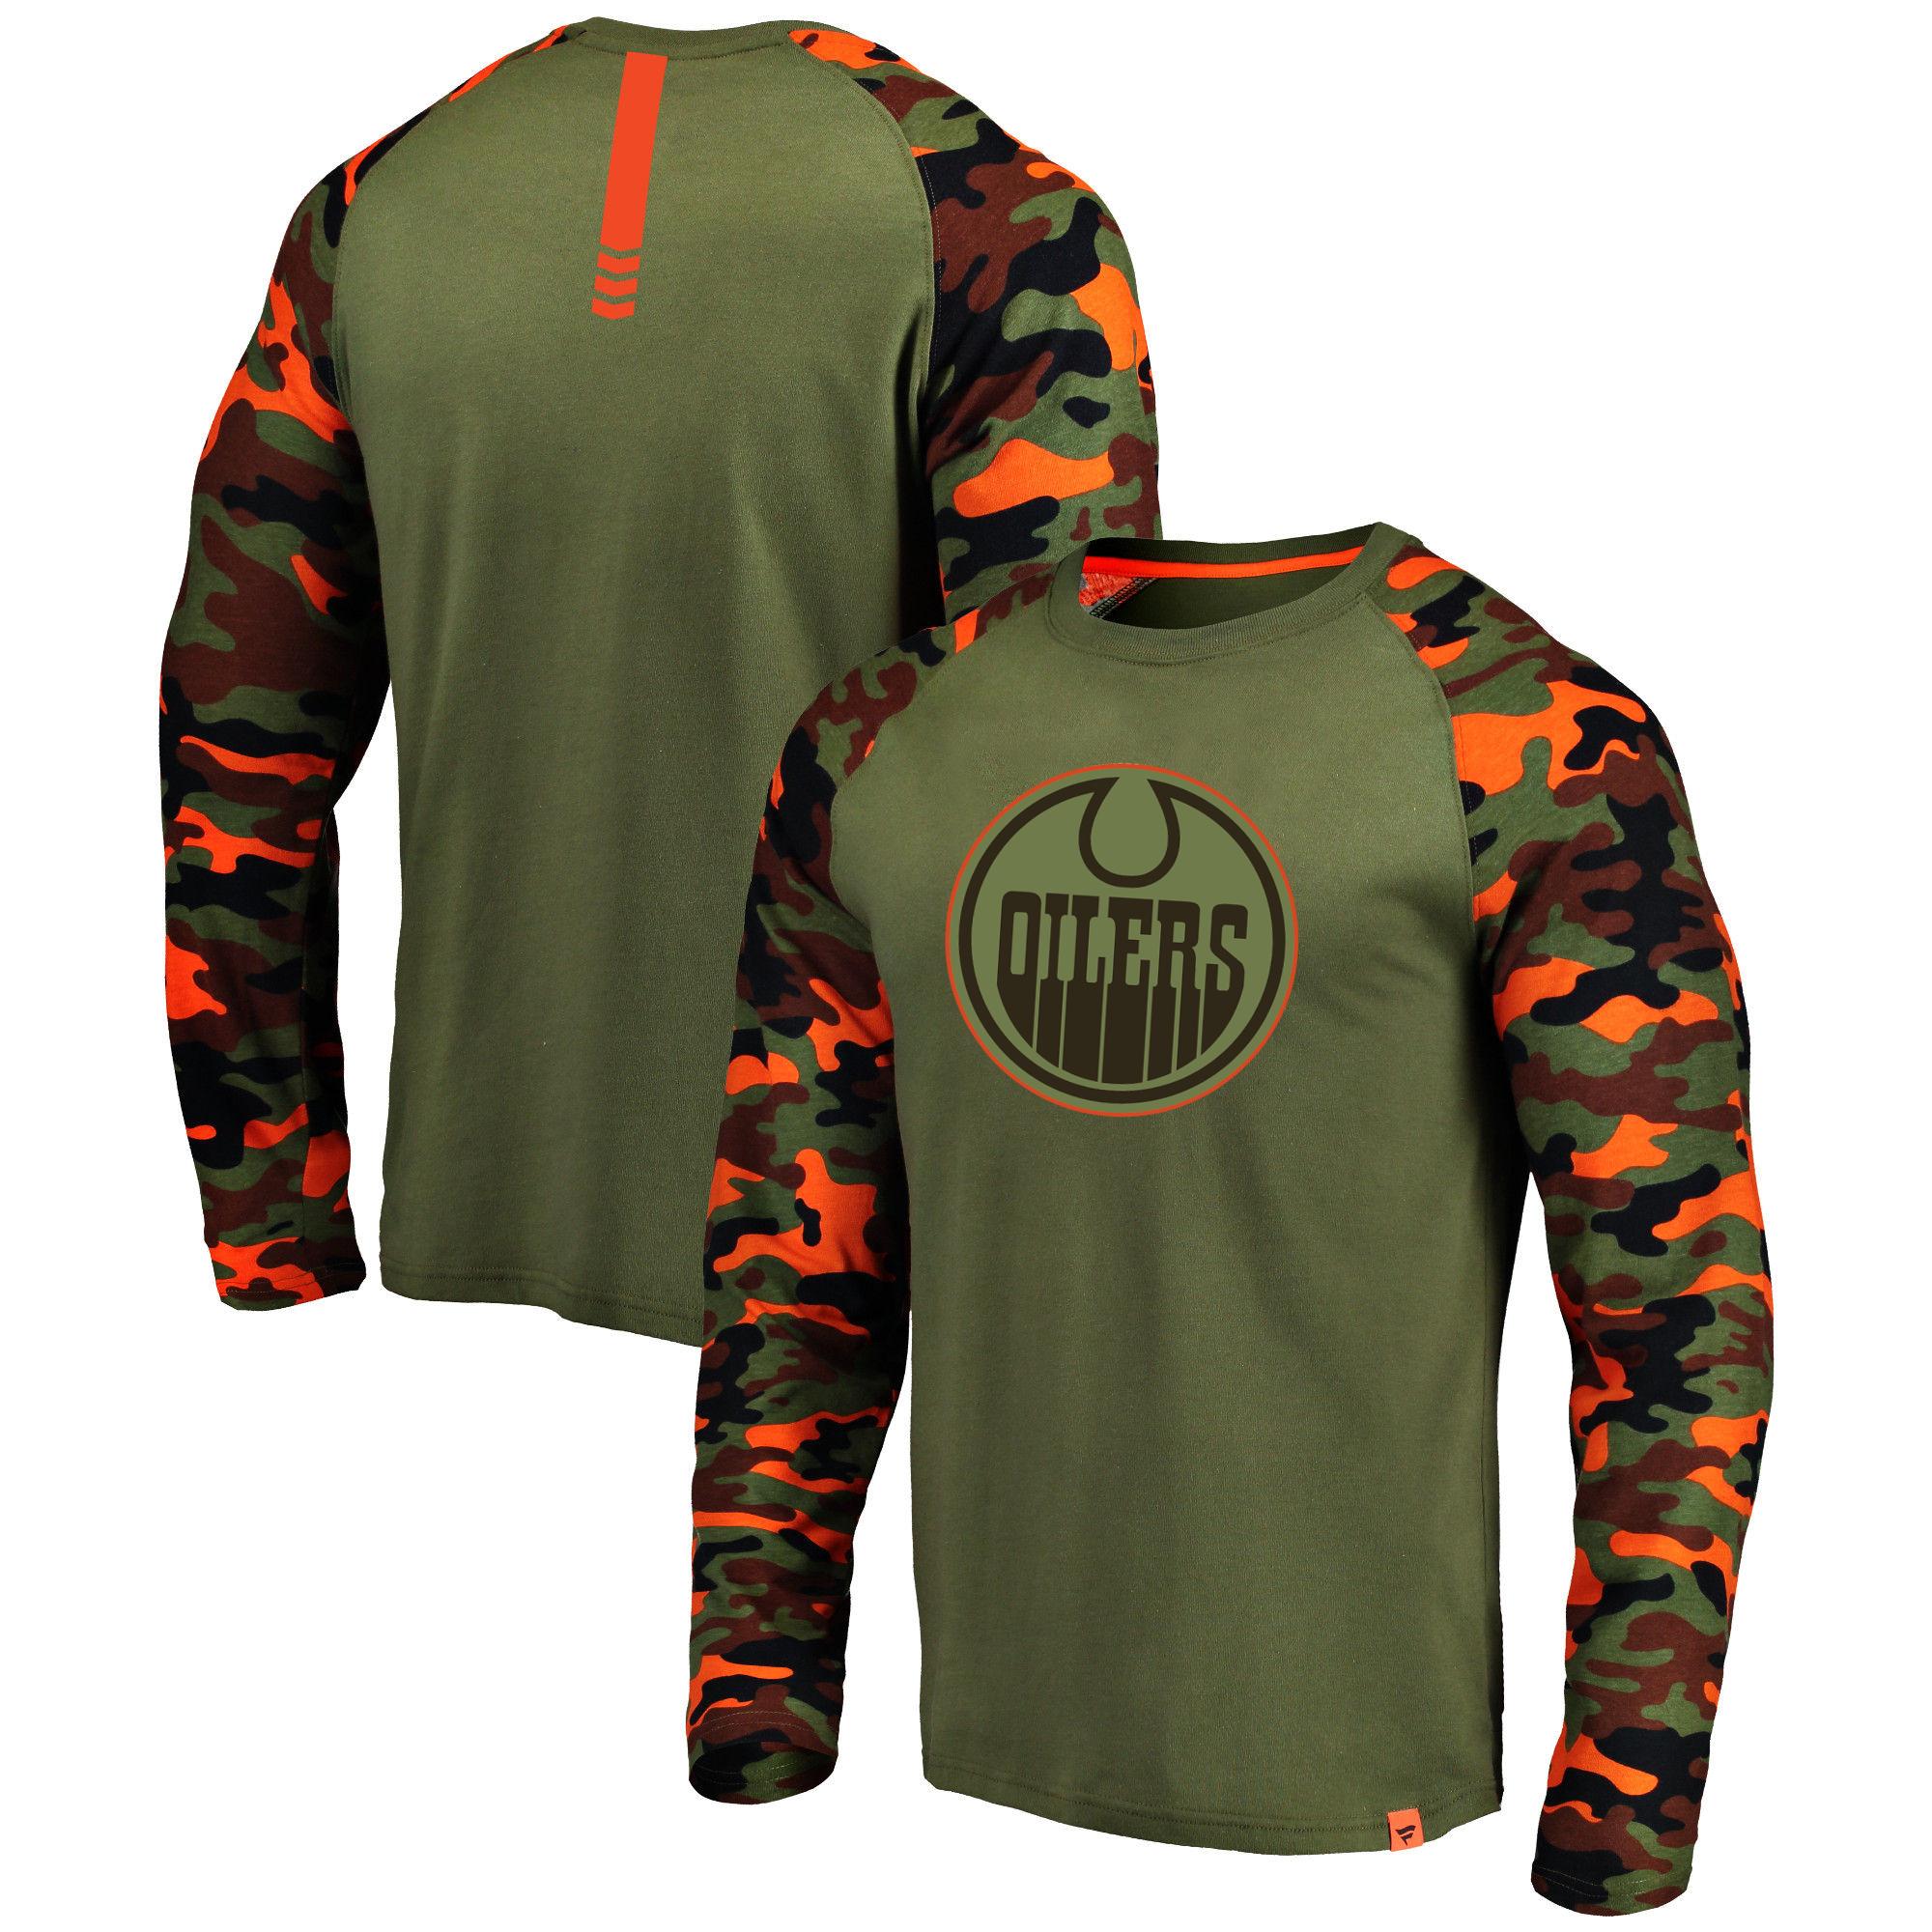 Edmonton Oilers Fanatics Branded Olive/Camo Recon Long Sleeve Raglan T-Shirt